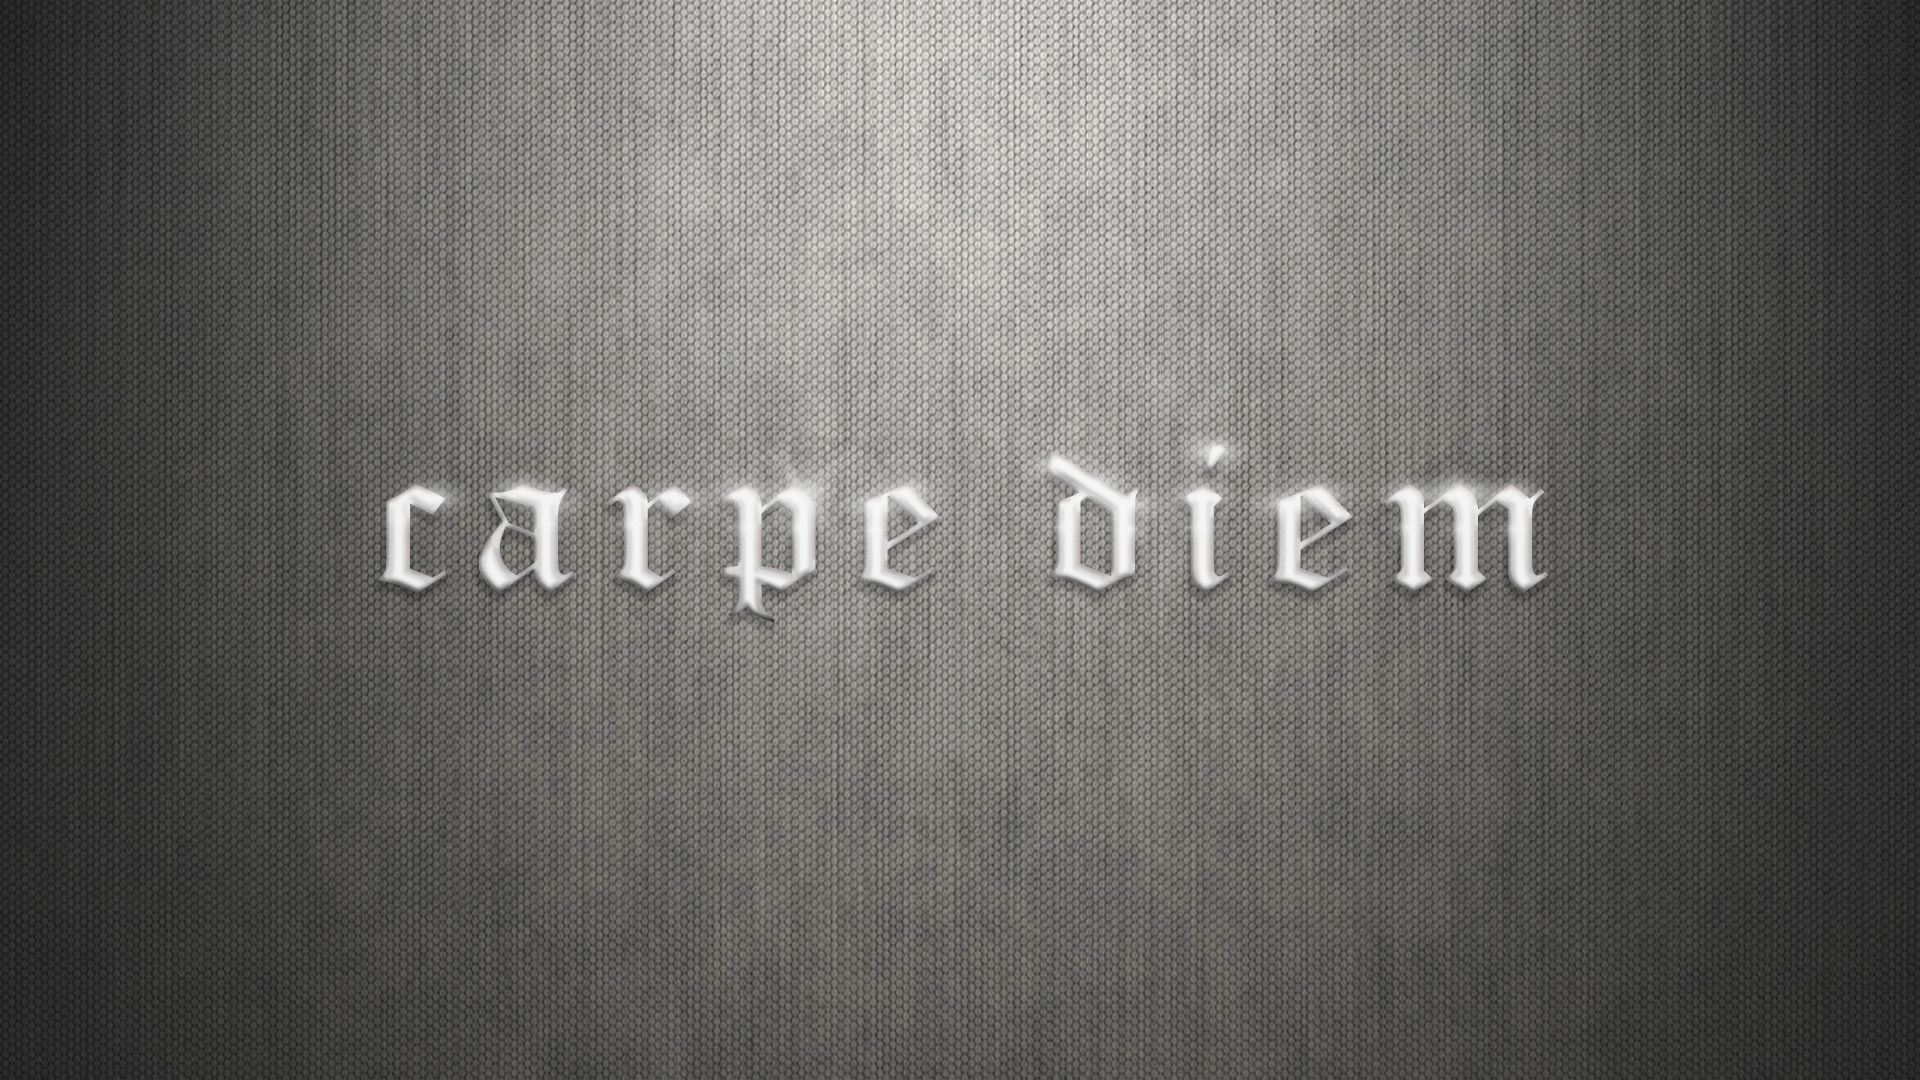 Carpe Diem hd wallpaper